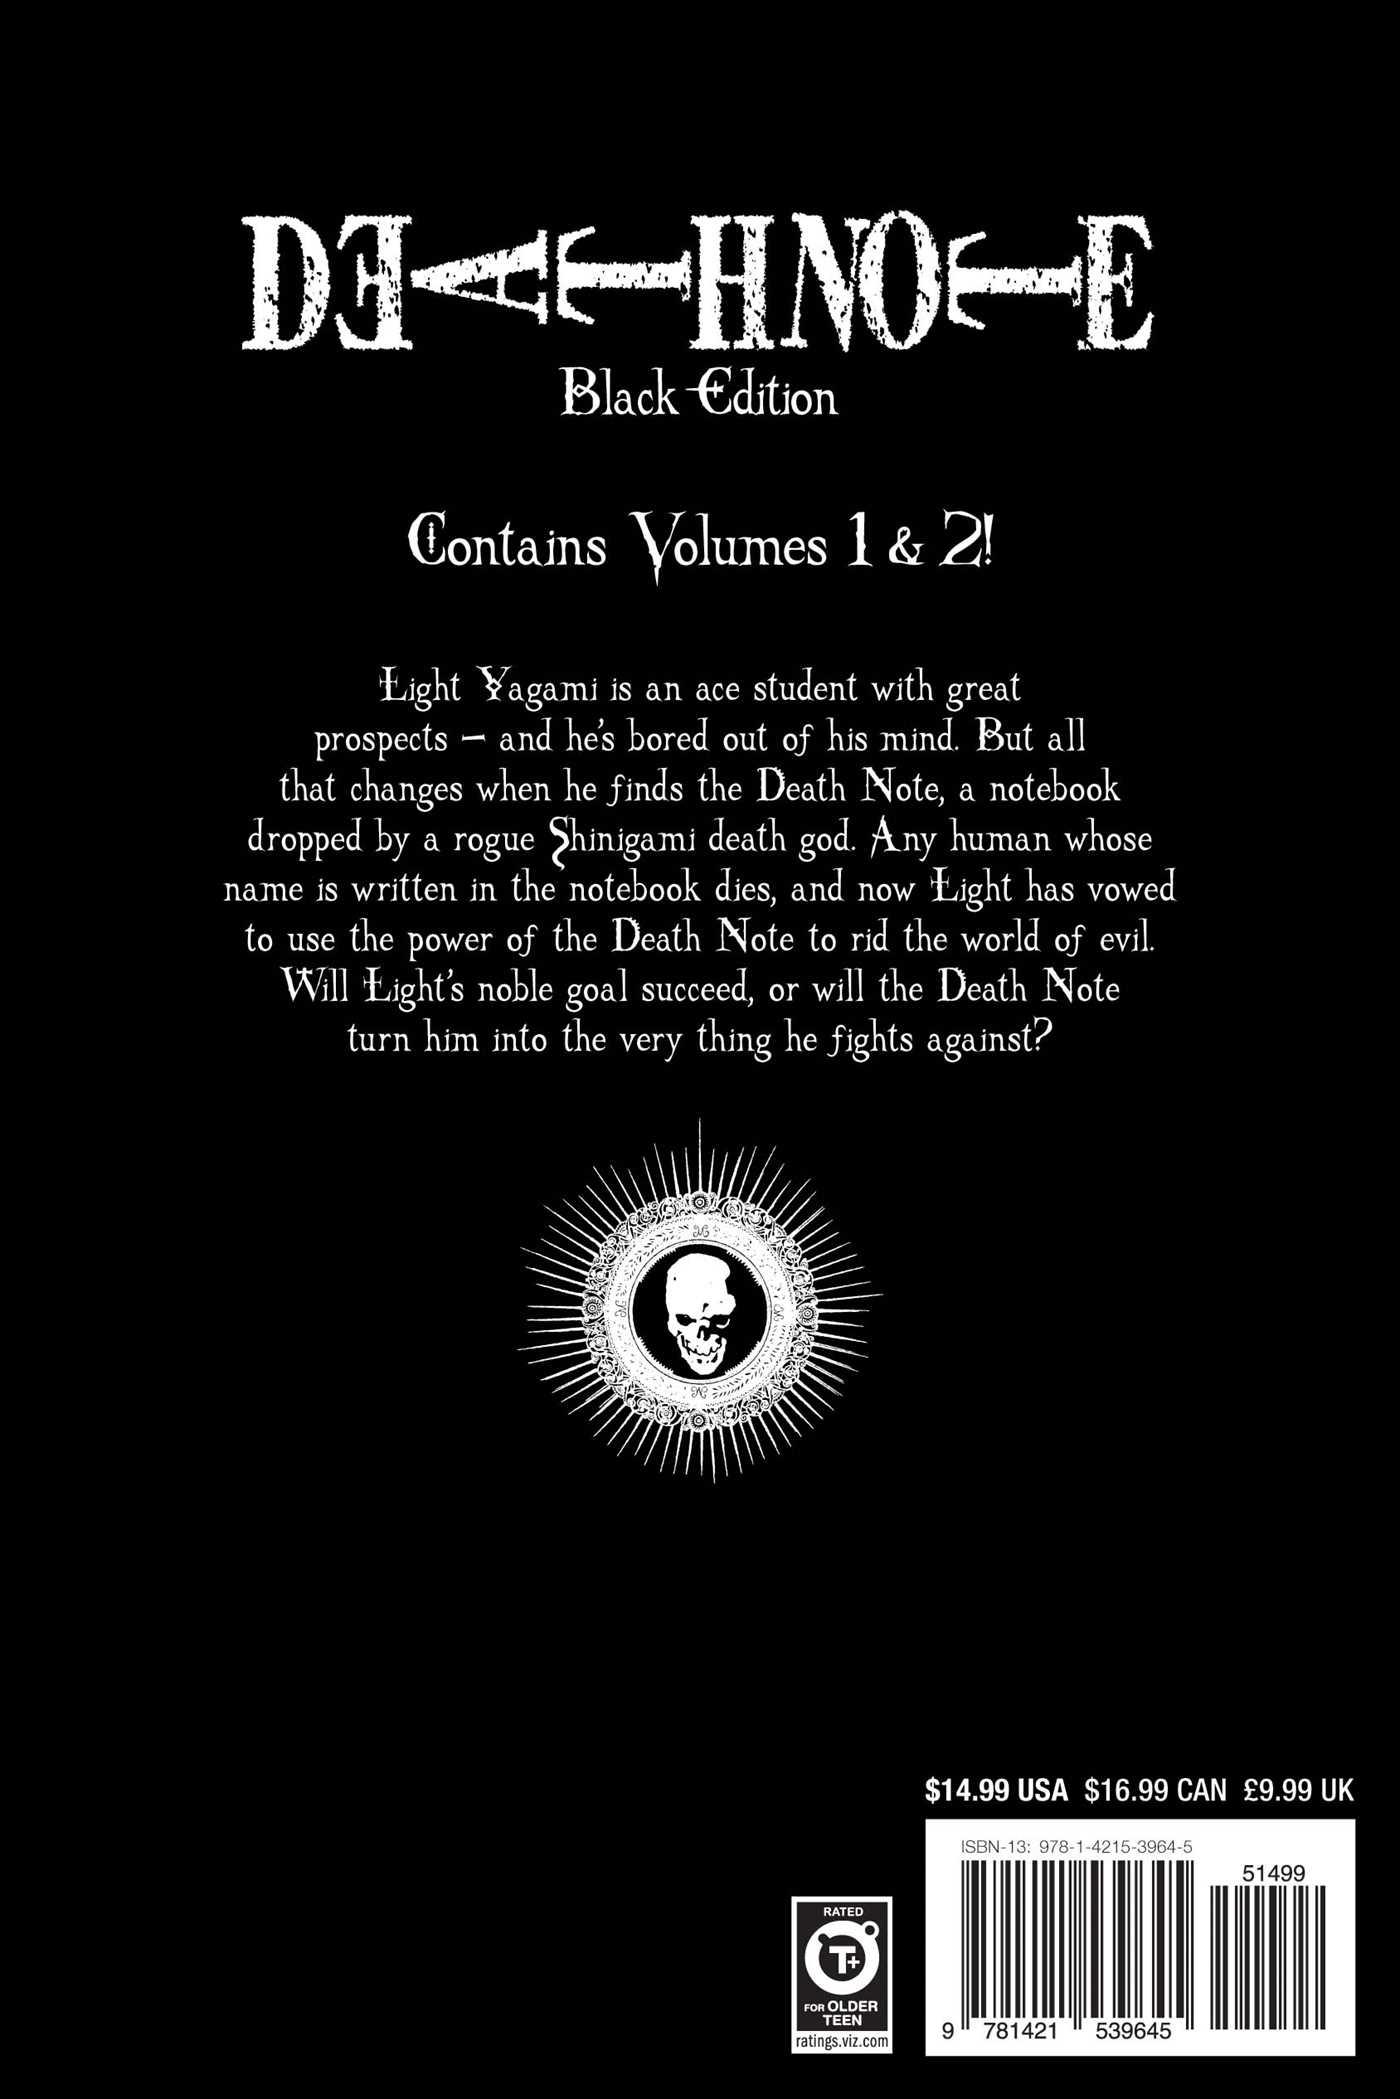 Death note black edition vol 1 9781421539645 hr back